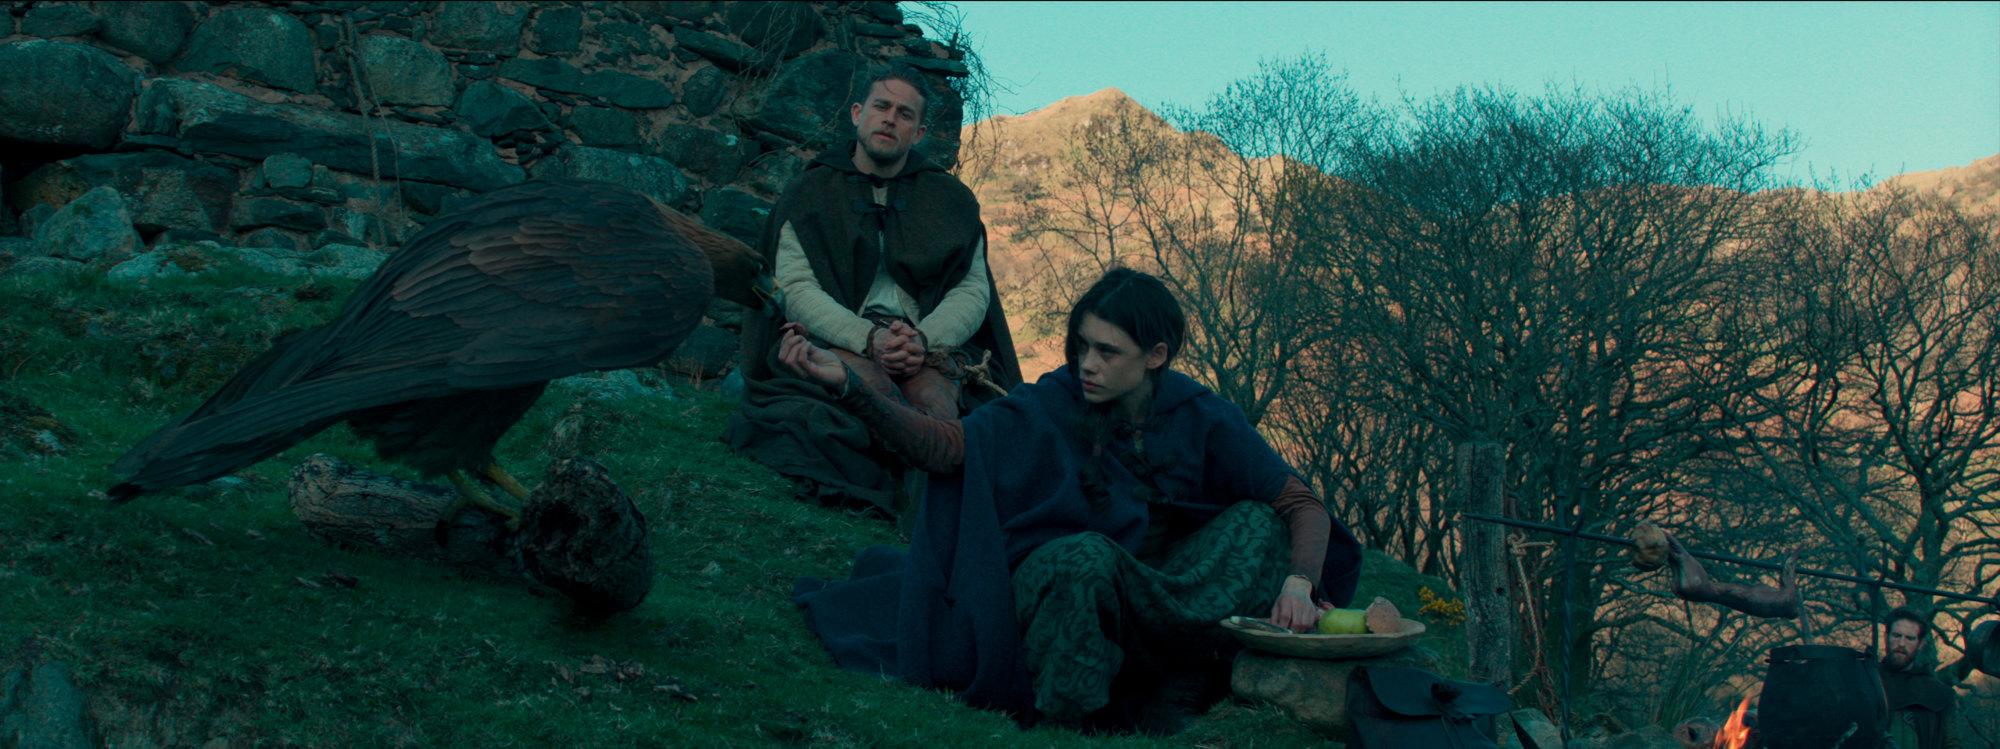 Charlie Hunnam v filmu Kralj Arthur: Legenda o meču (King Arthur: The Legend of the Sword)